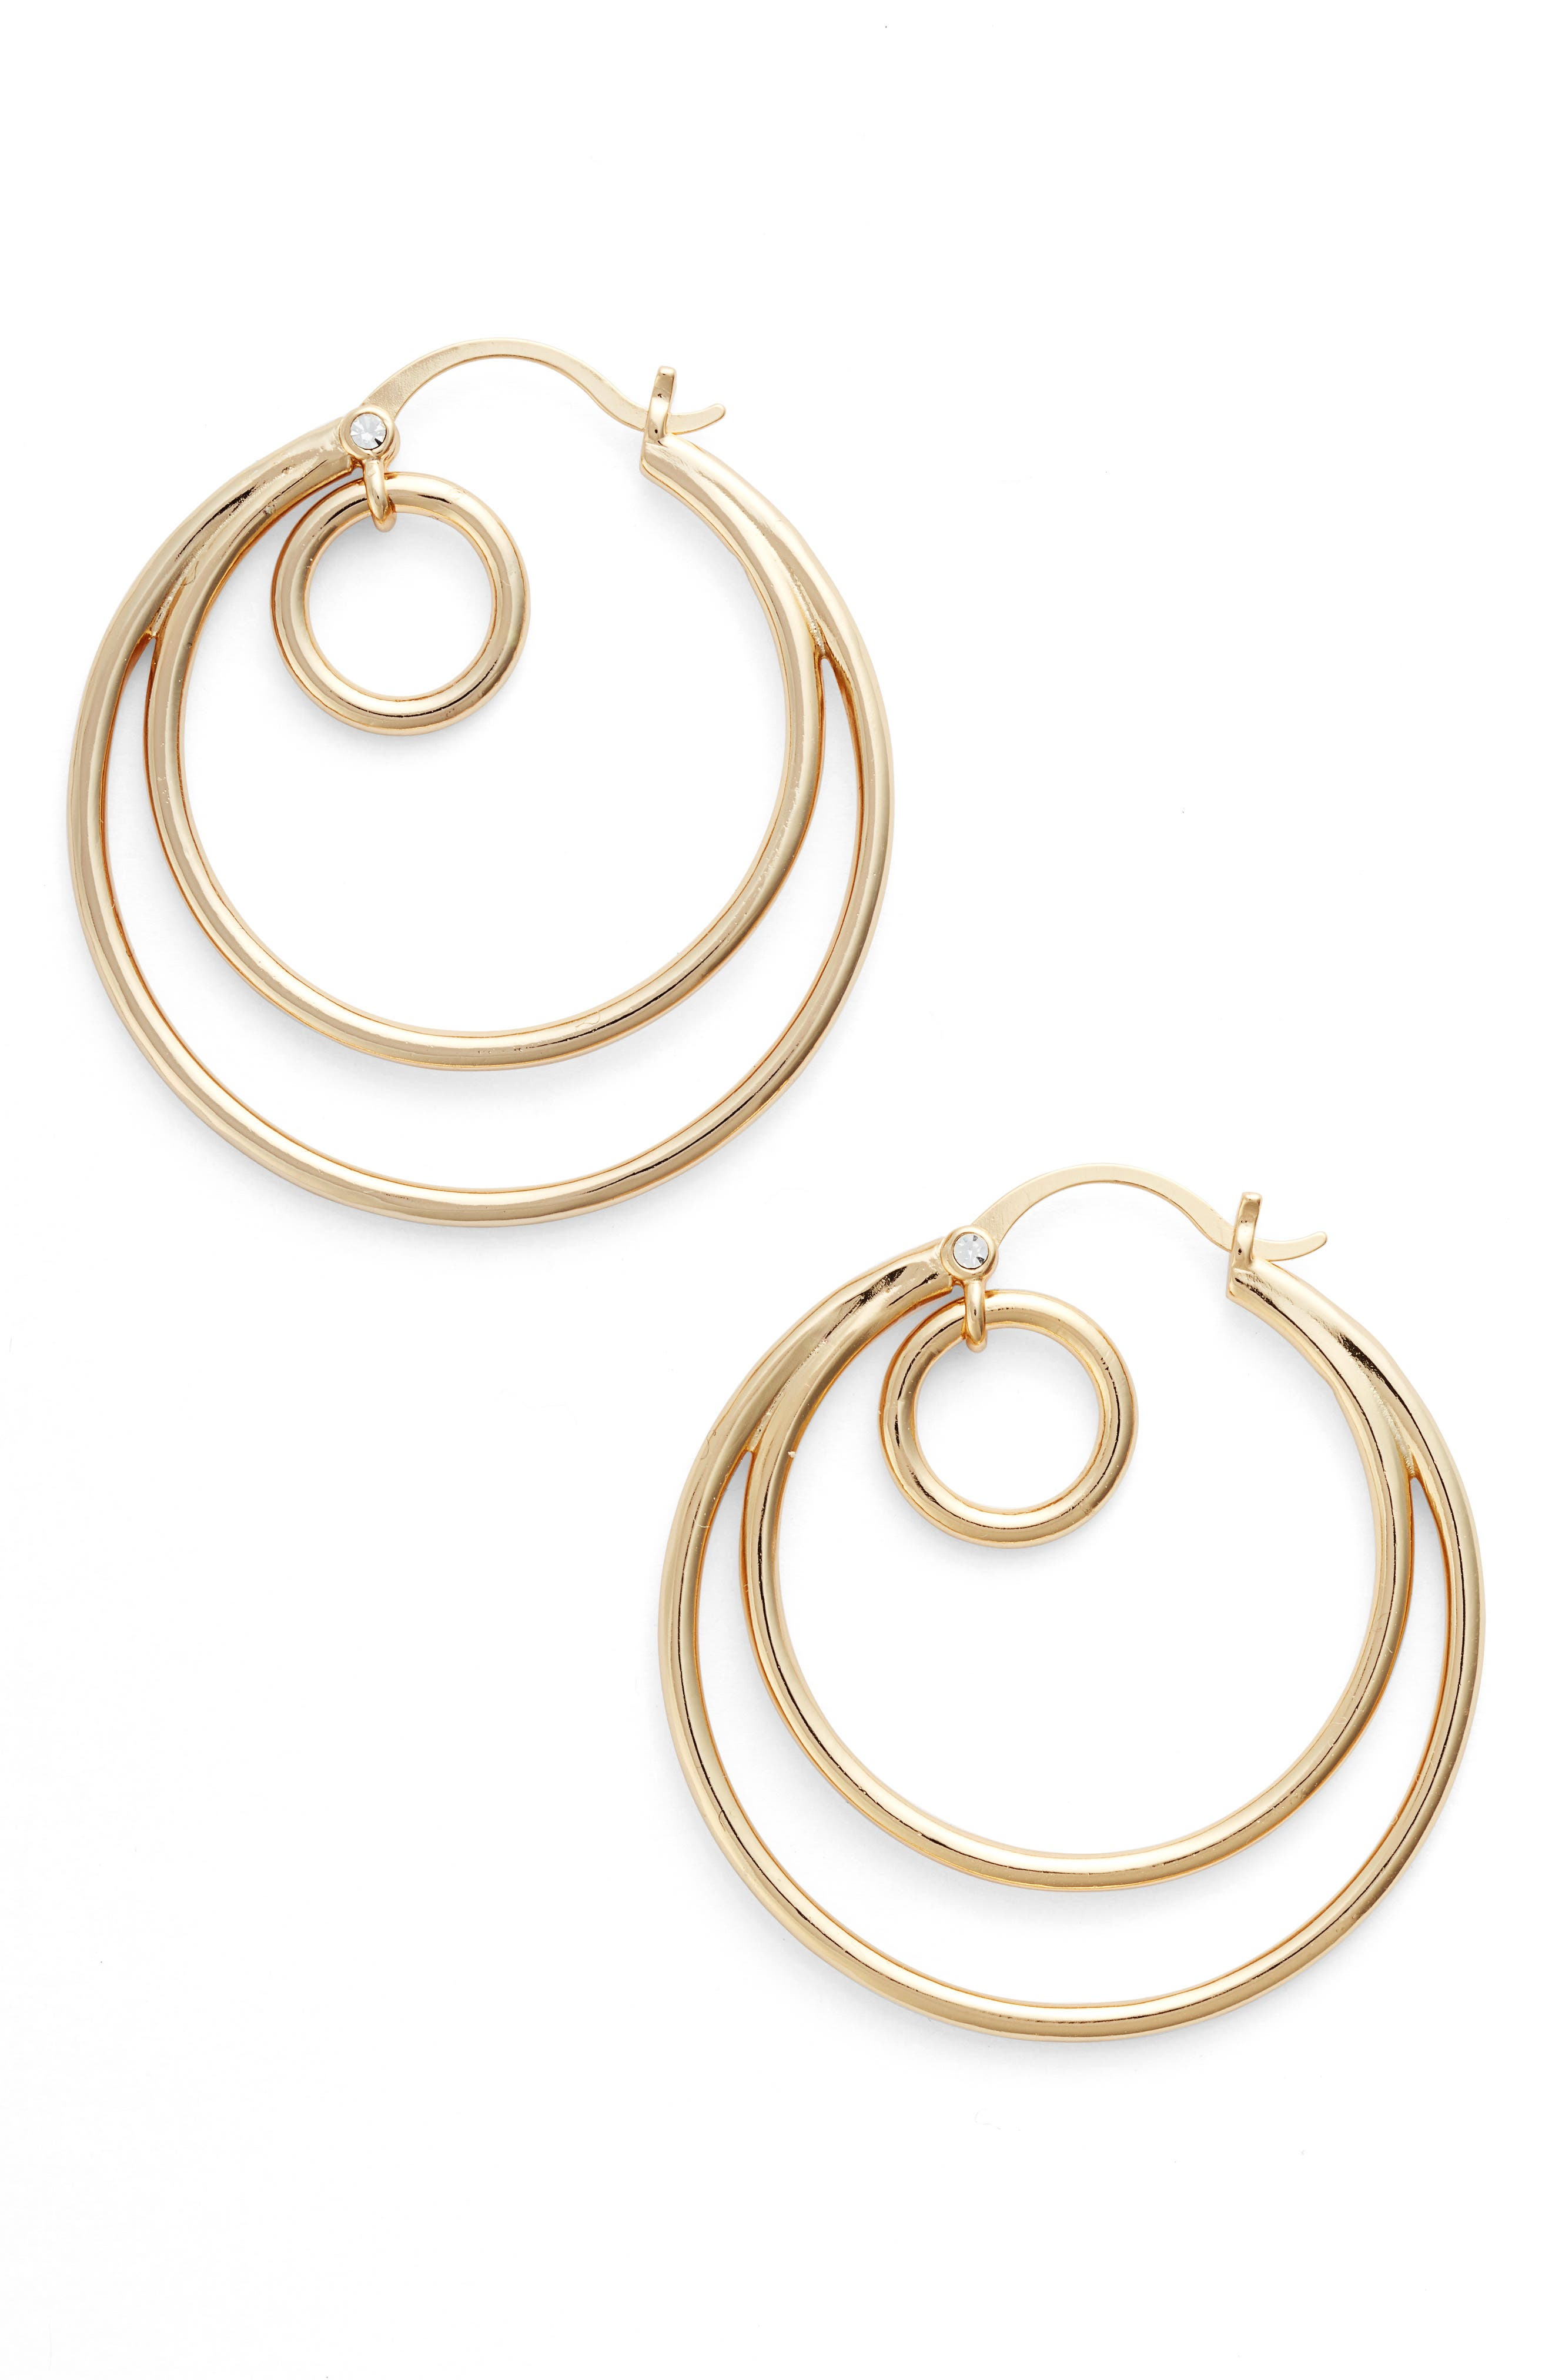 JULES SMITH Galaxy Hoop Earrings